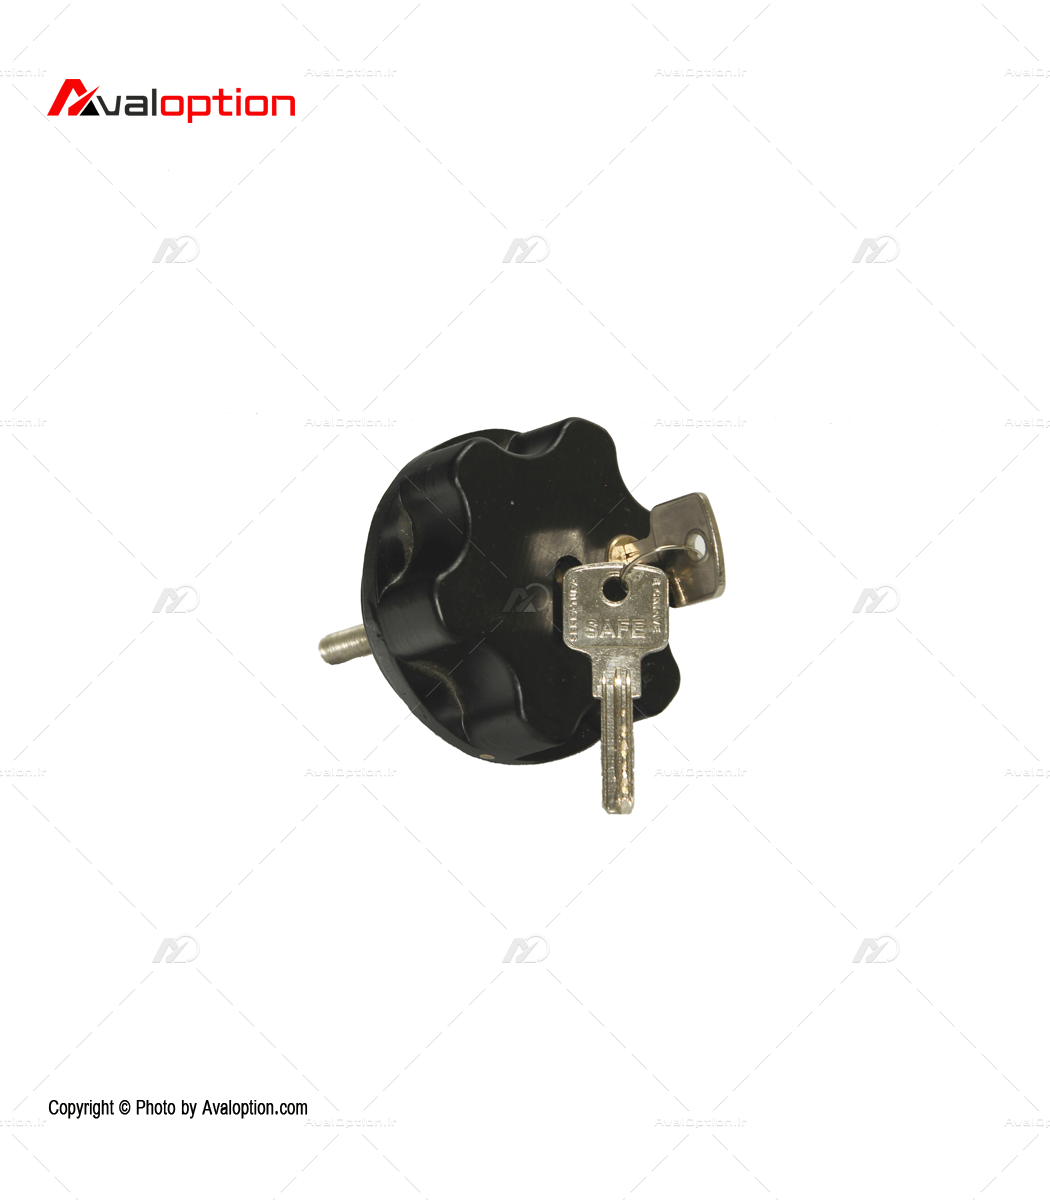 قفل زاپاس هایما S5 و H30cross